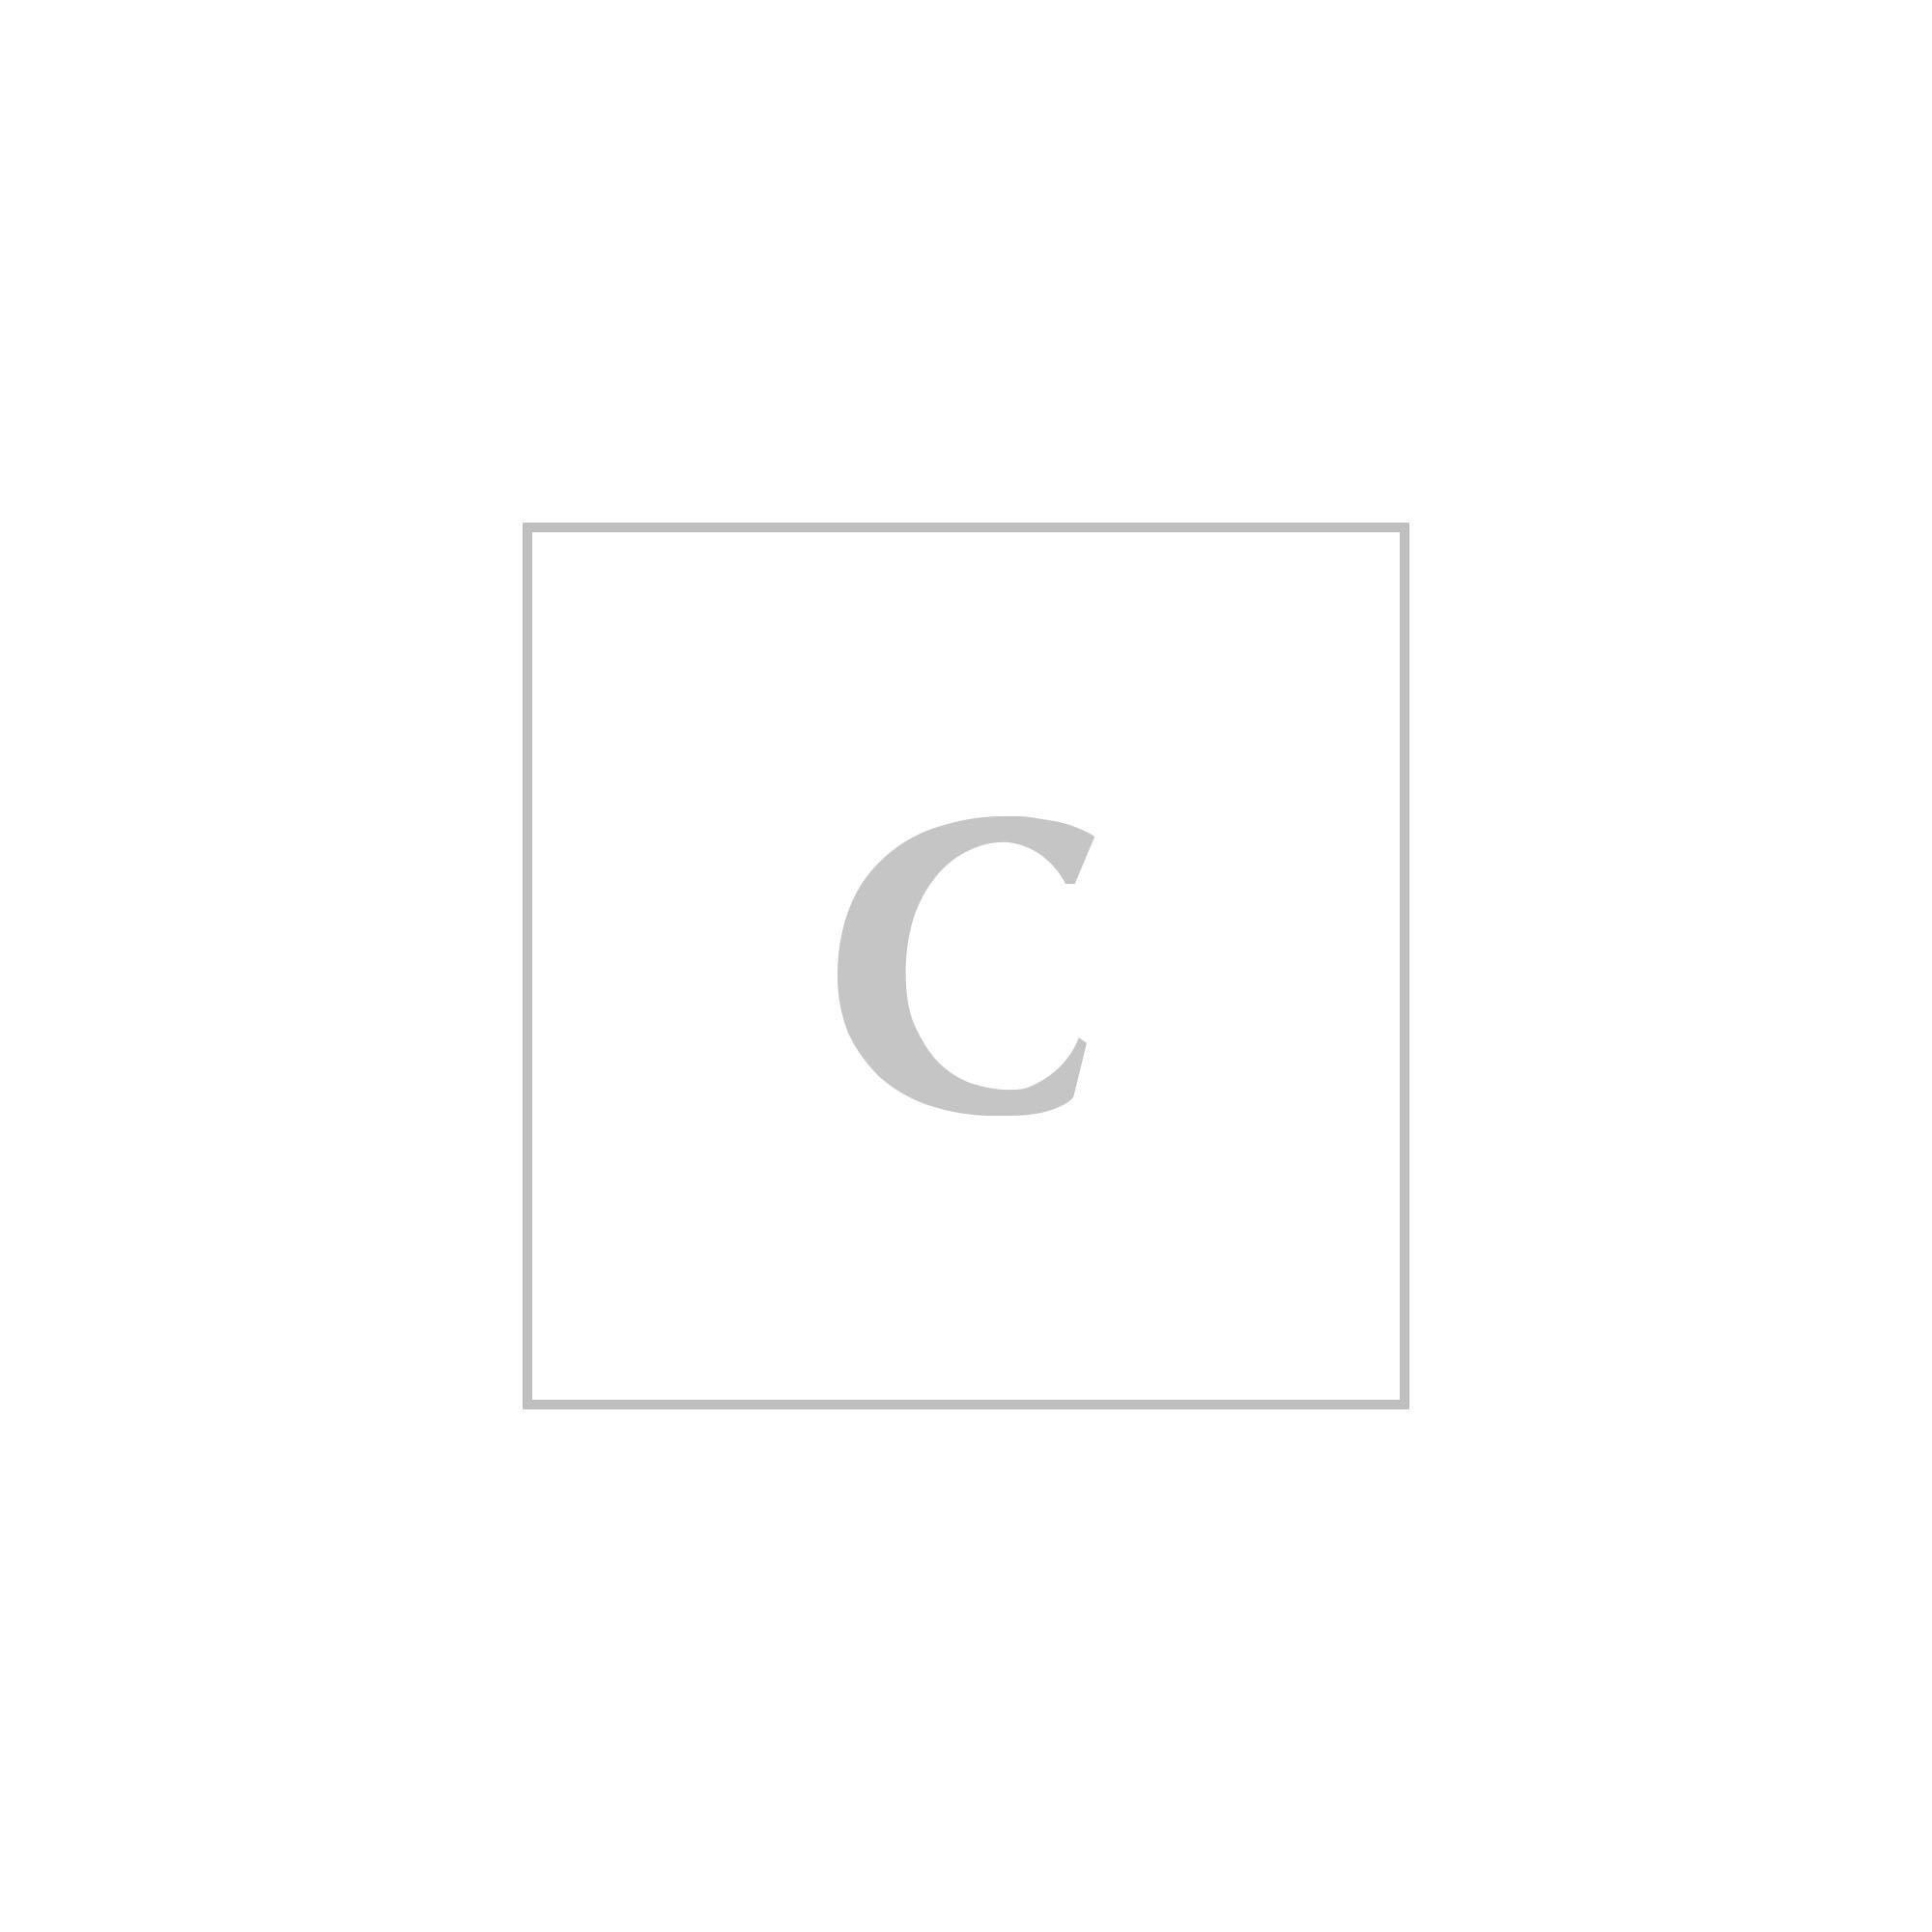 Saint laurent ysl borsa tracolla monogram portachiavi